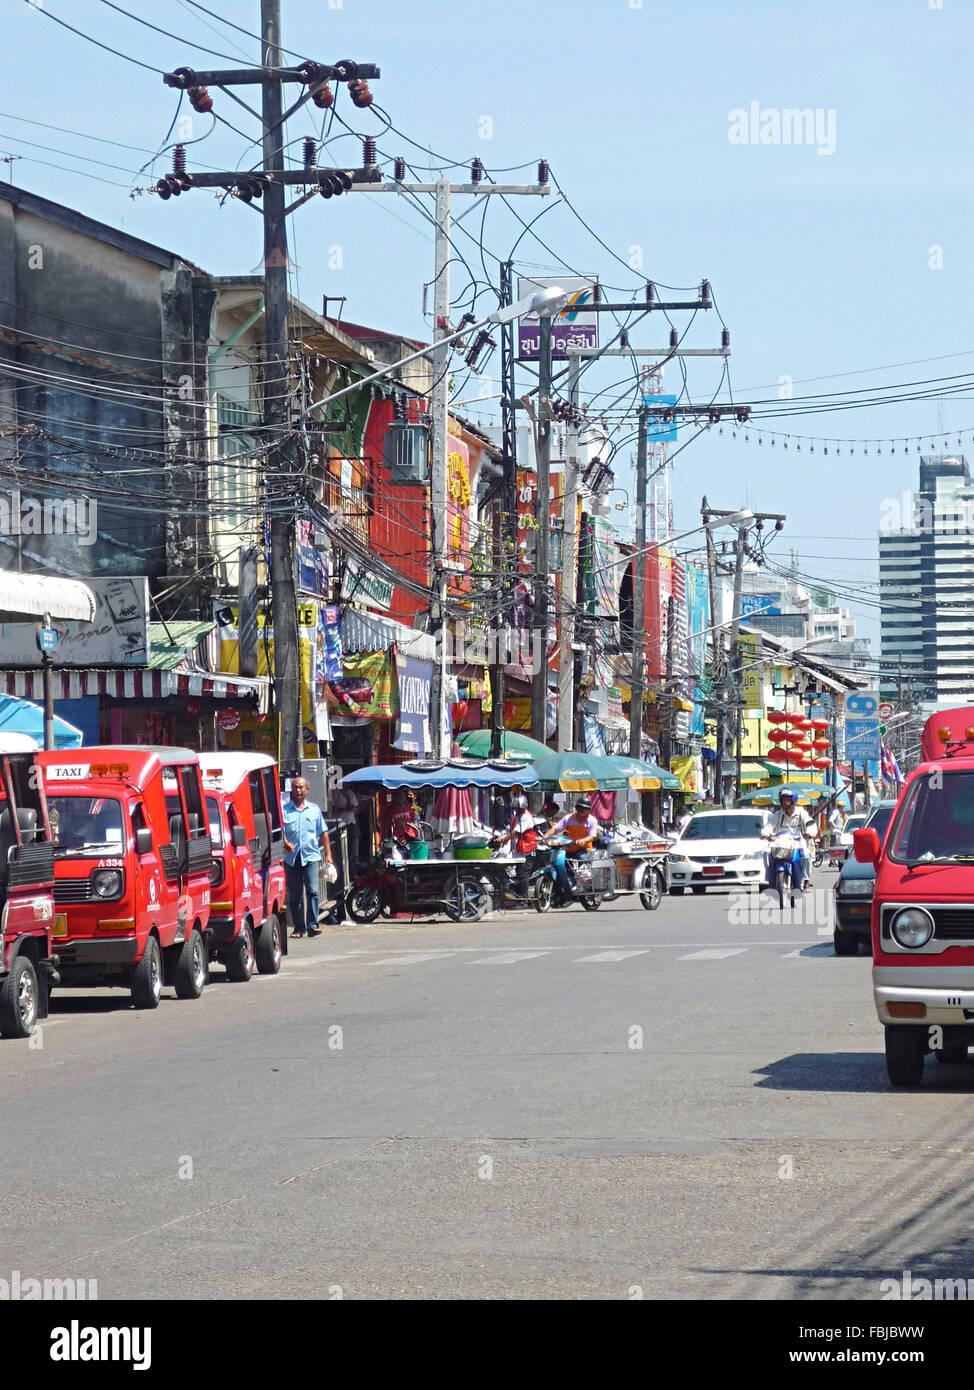 Sunshades For Trucks >> Street, power poles, power lines, cars, Phuket Town, Thailand, Asia Stock Photo: 93217541 - Alamy